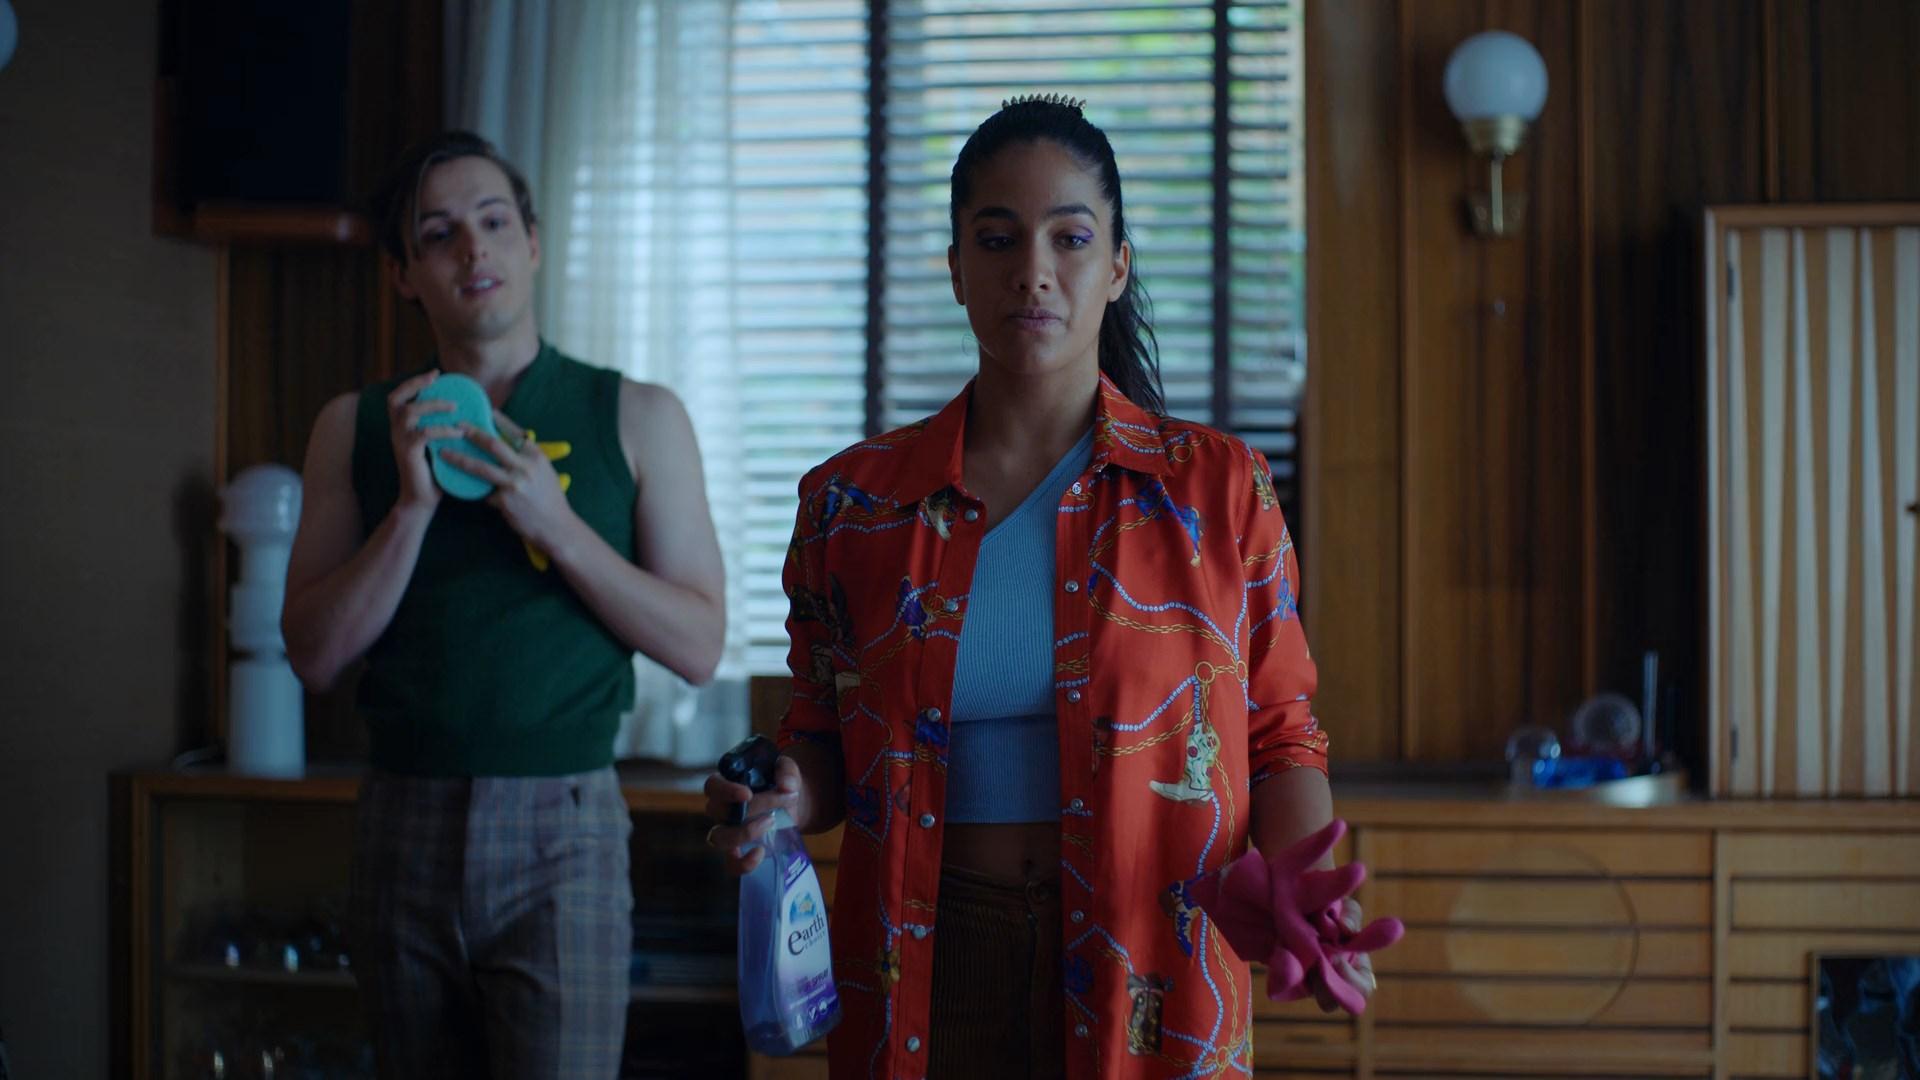 ¿Por qué eres así? Temporada 1 (2018) 1080p WEB-DL Latino